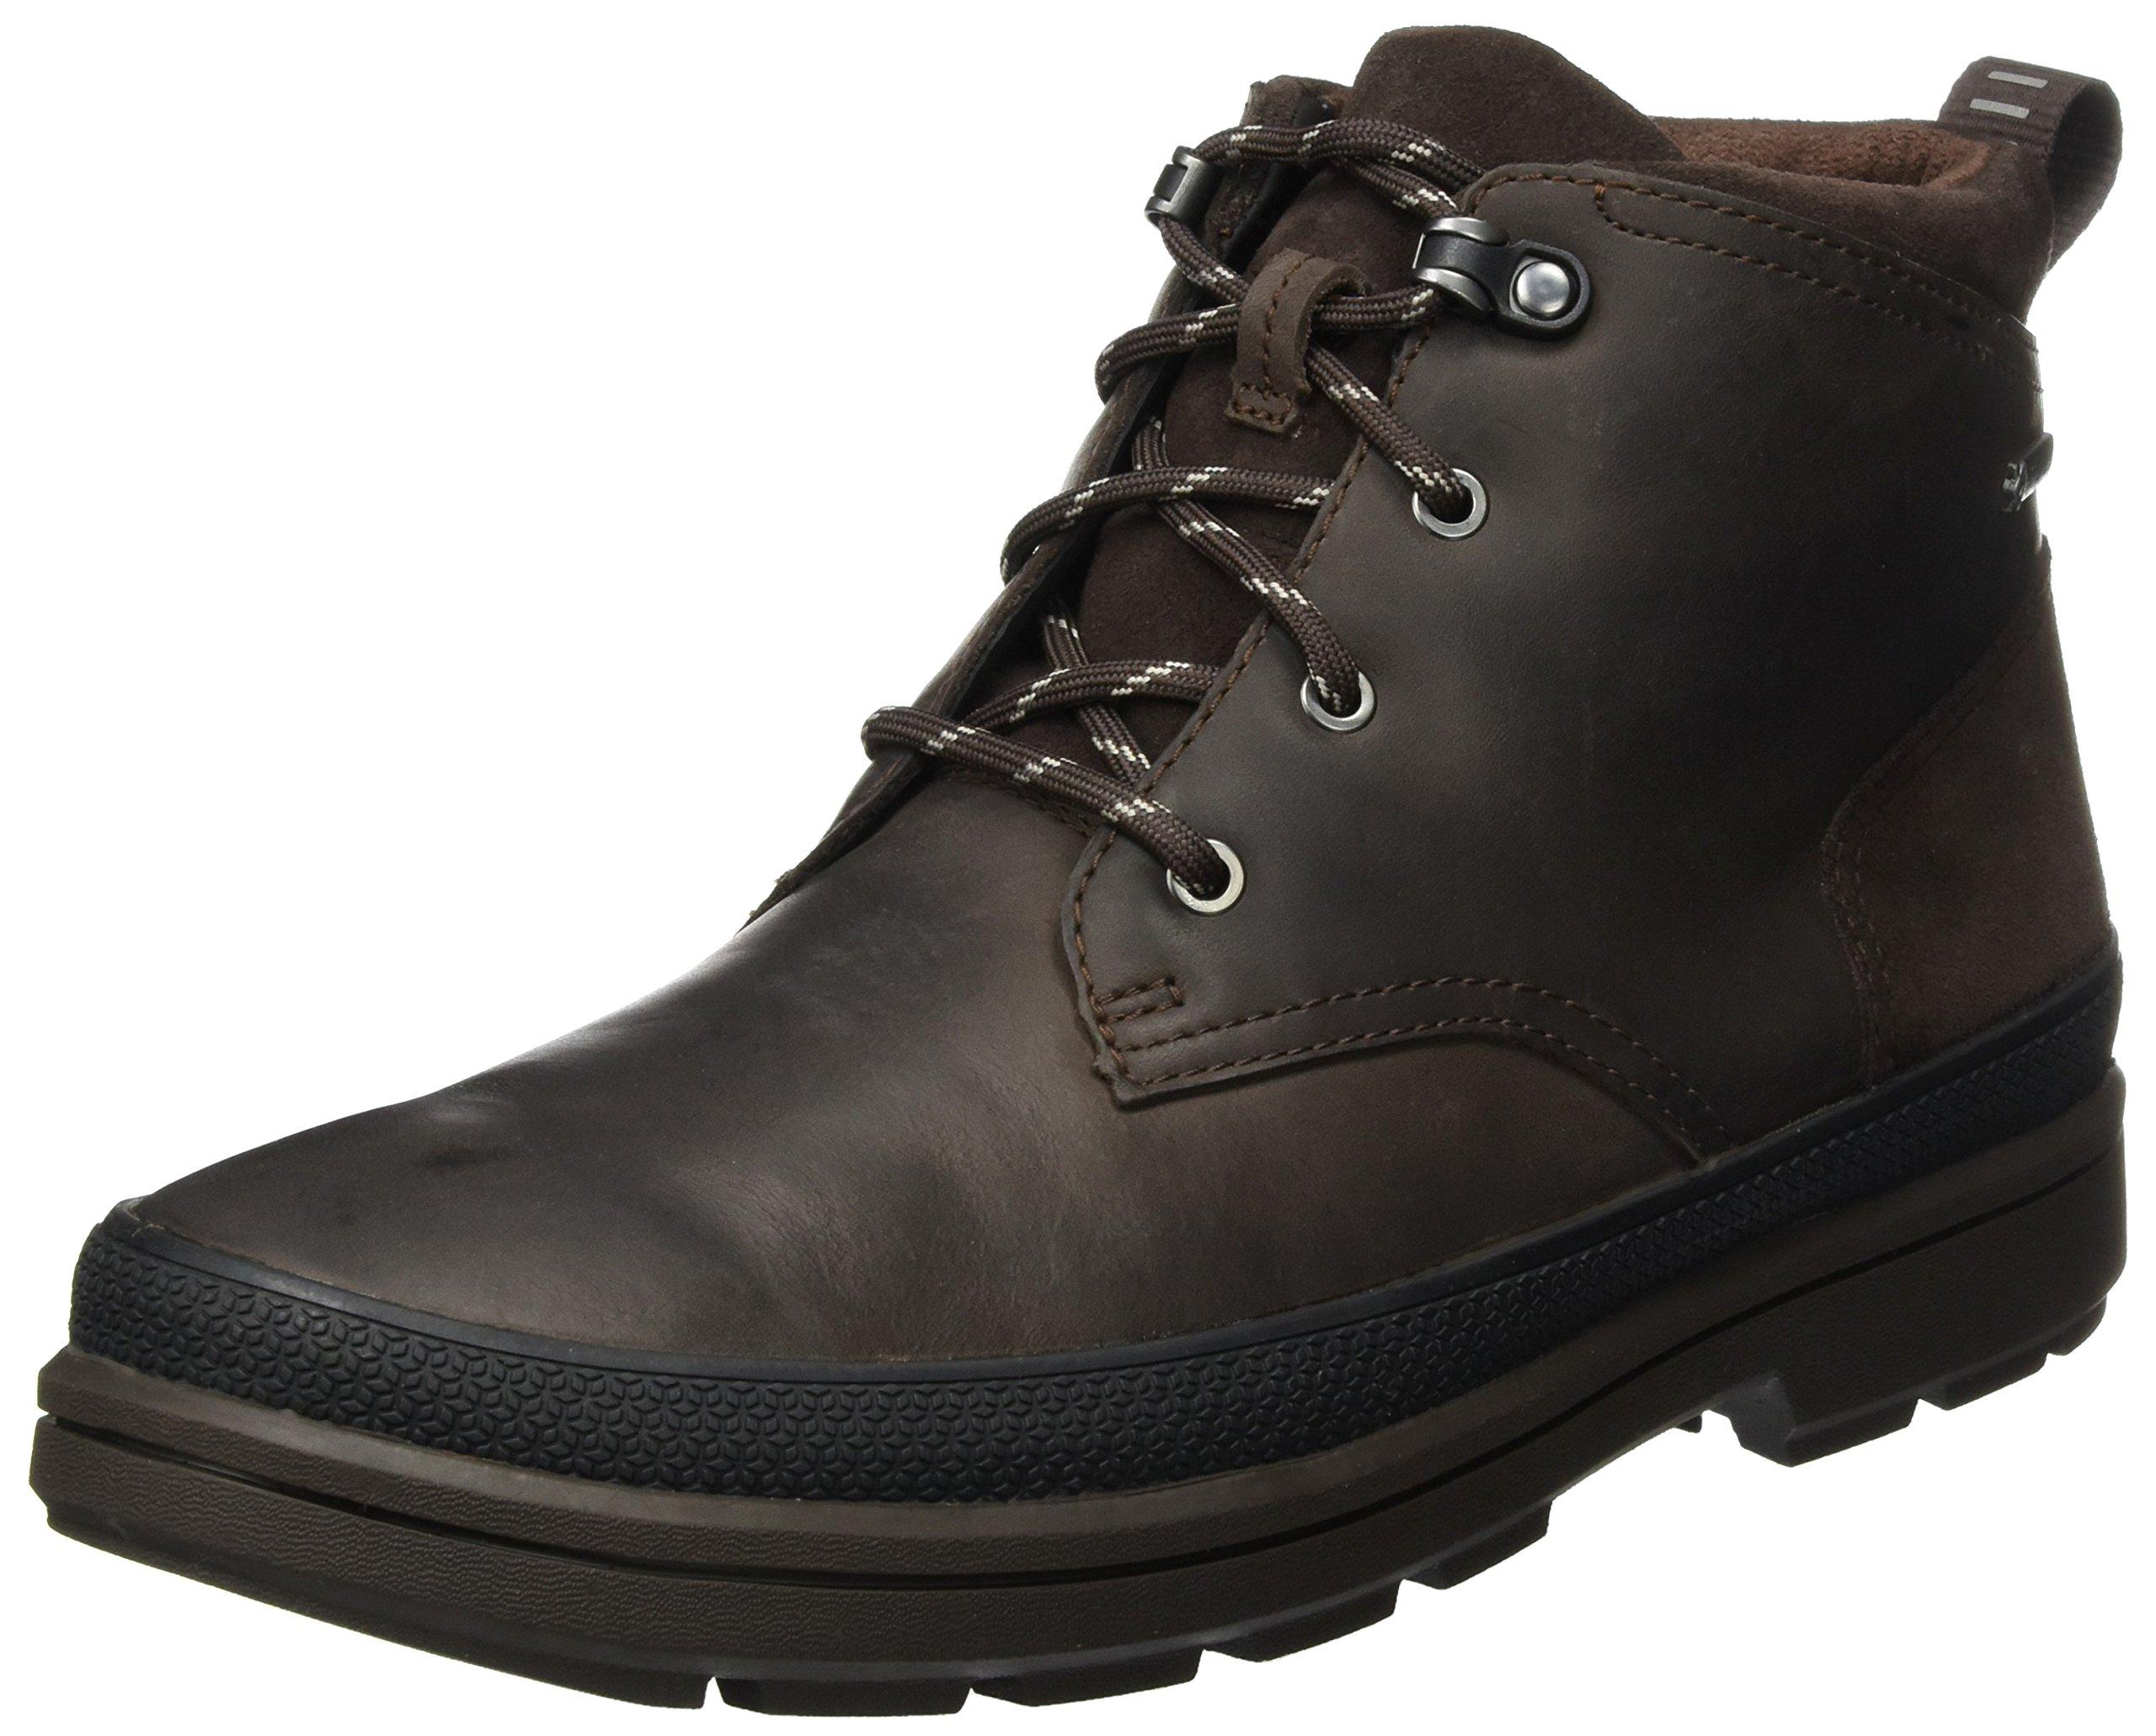 Eu Clarks Classiques Leather41 5 Rushwaymid HommeMarrondark GtxBottes Brown Nm08nw